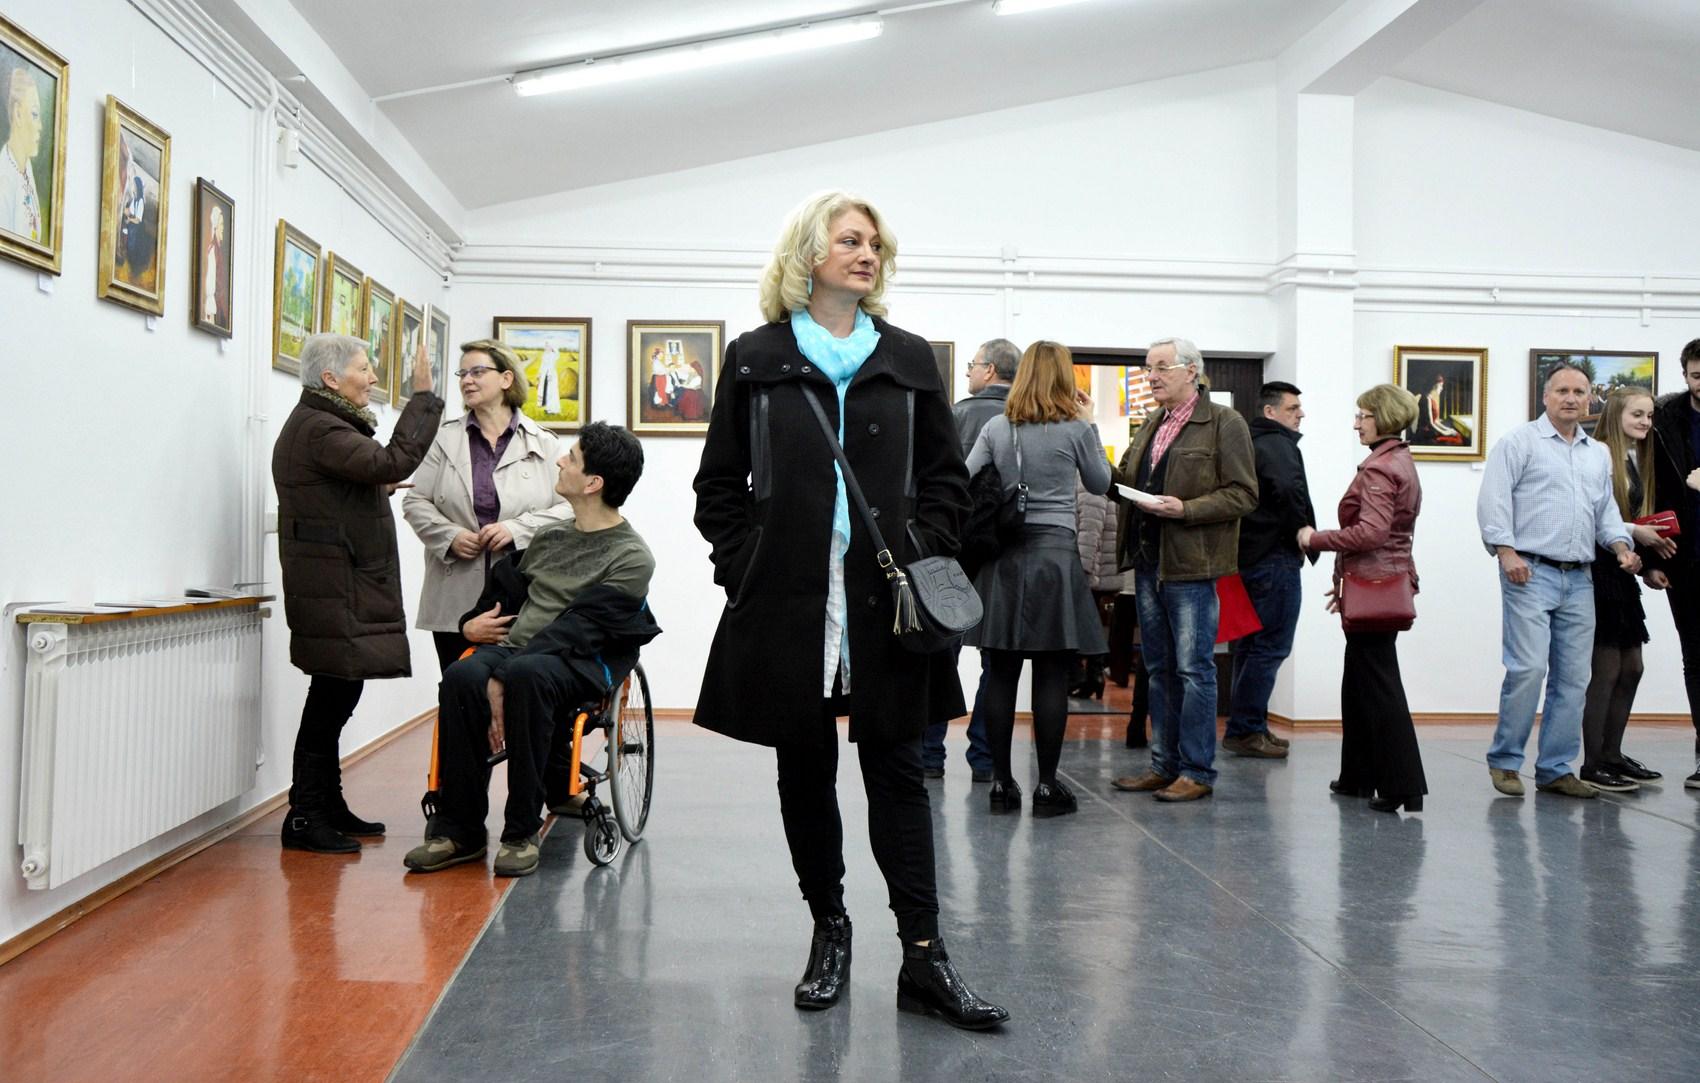 Izložba Anđelko Brkić Galerija Sunce 2017 47